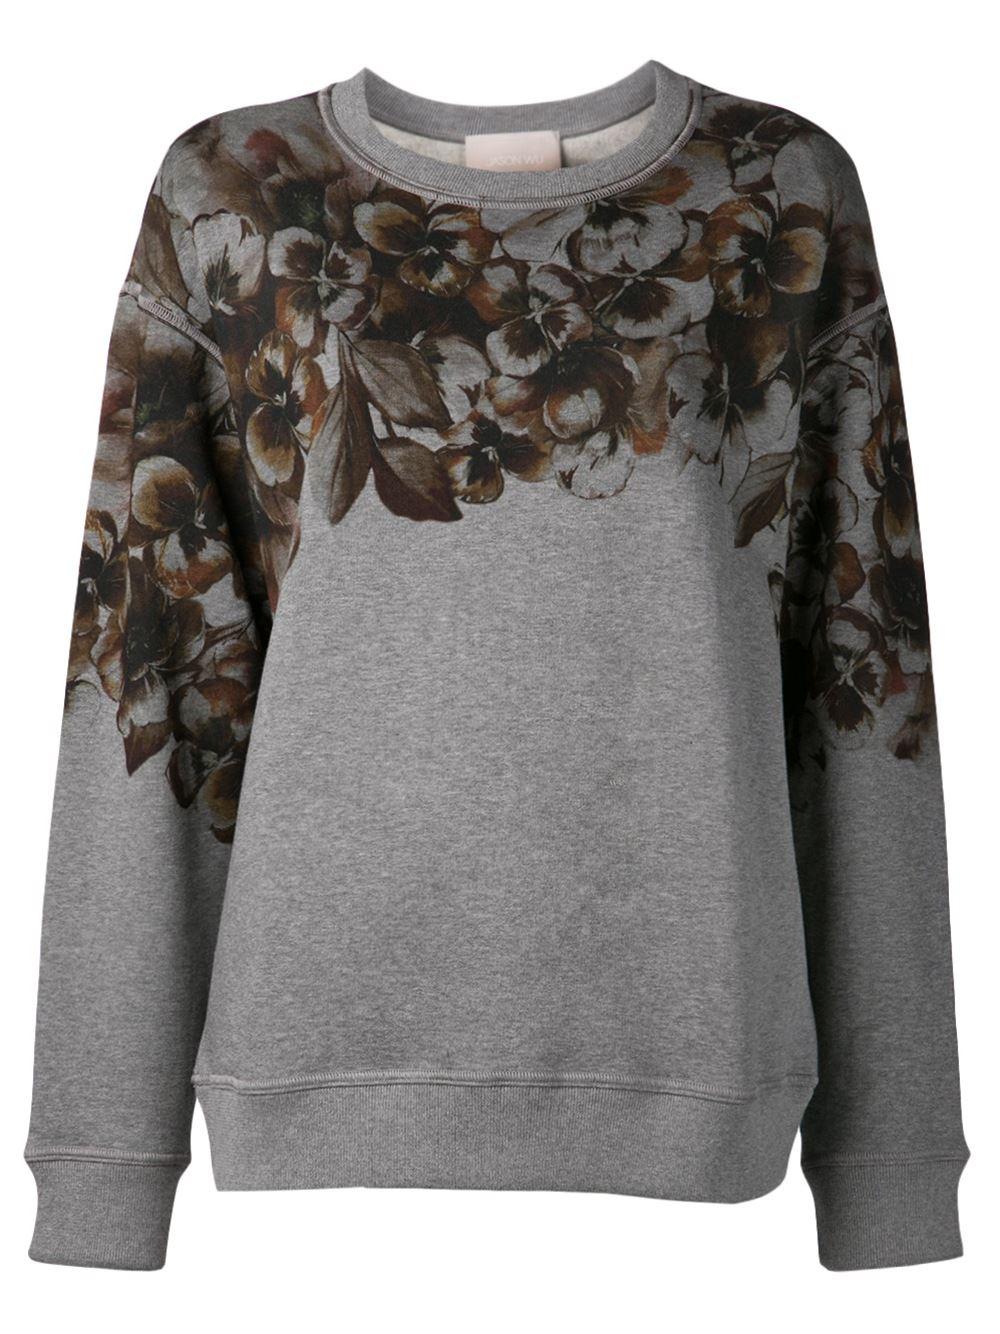 Lyst Jason Wu Floral Print Sweatshirt In Gray